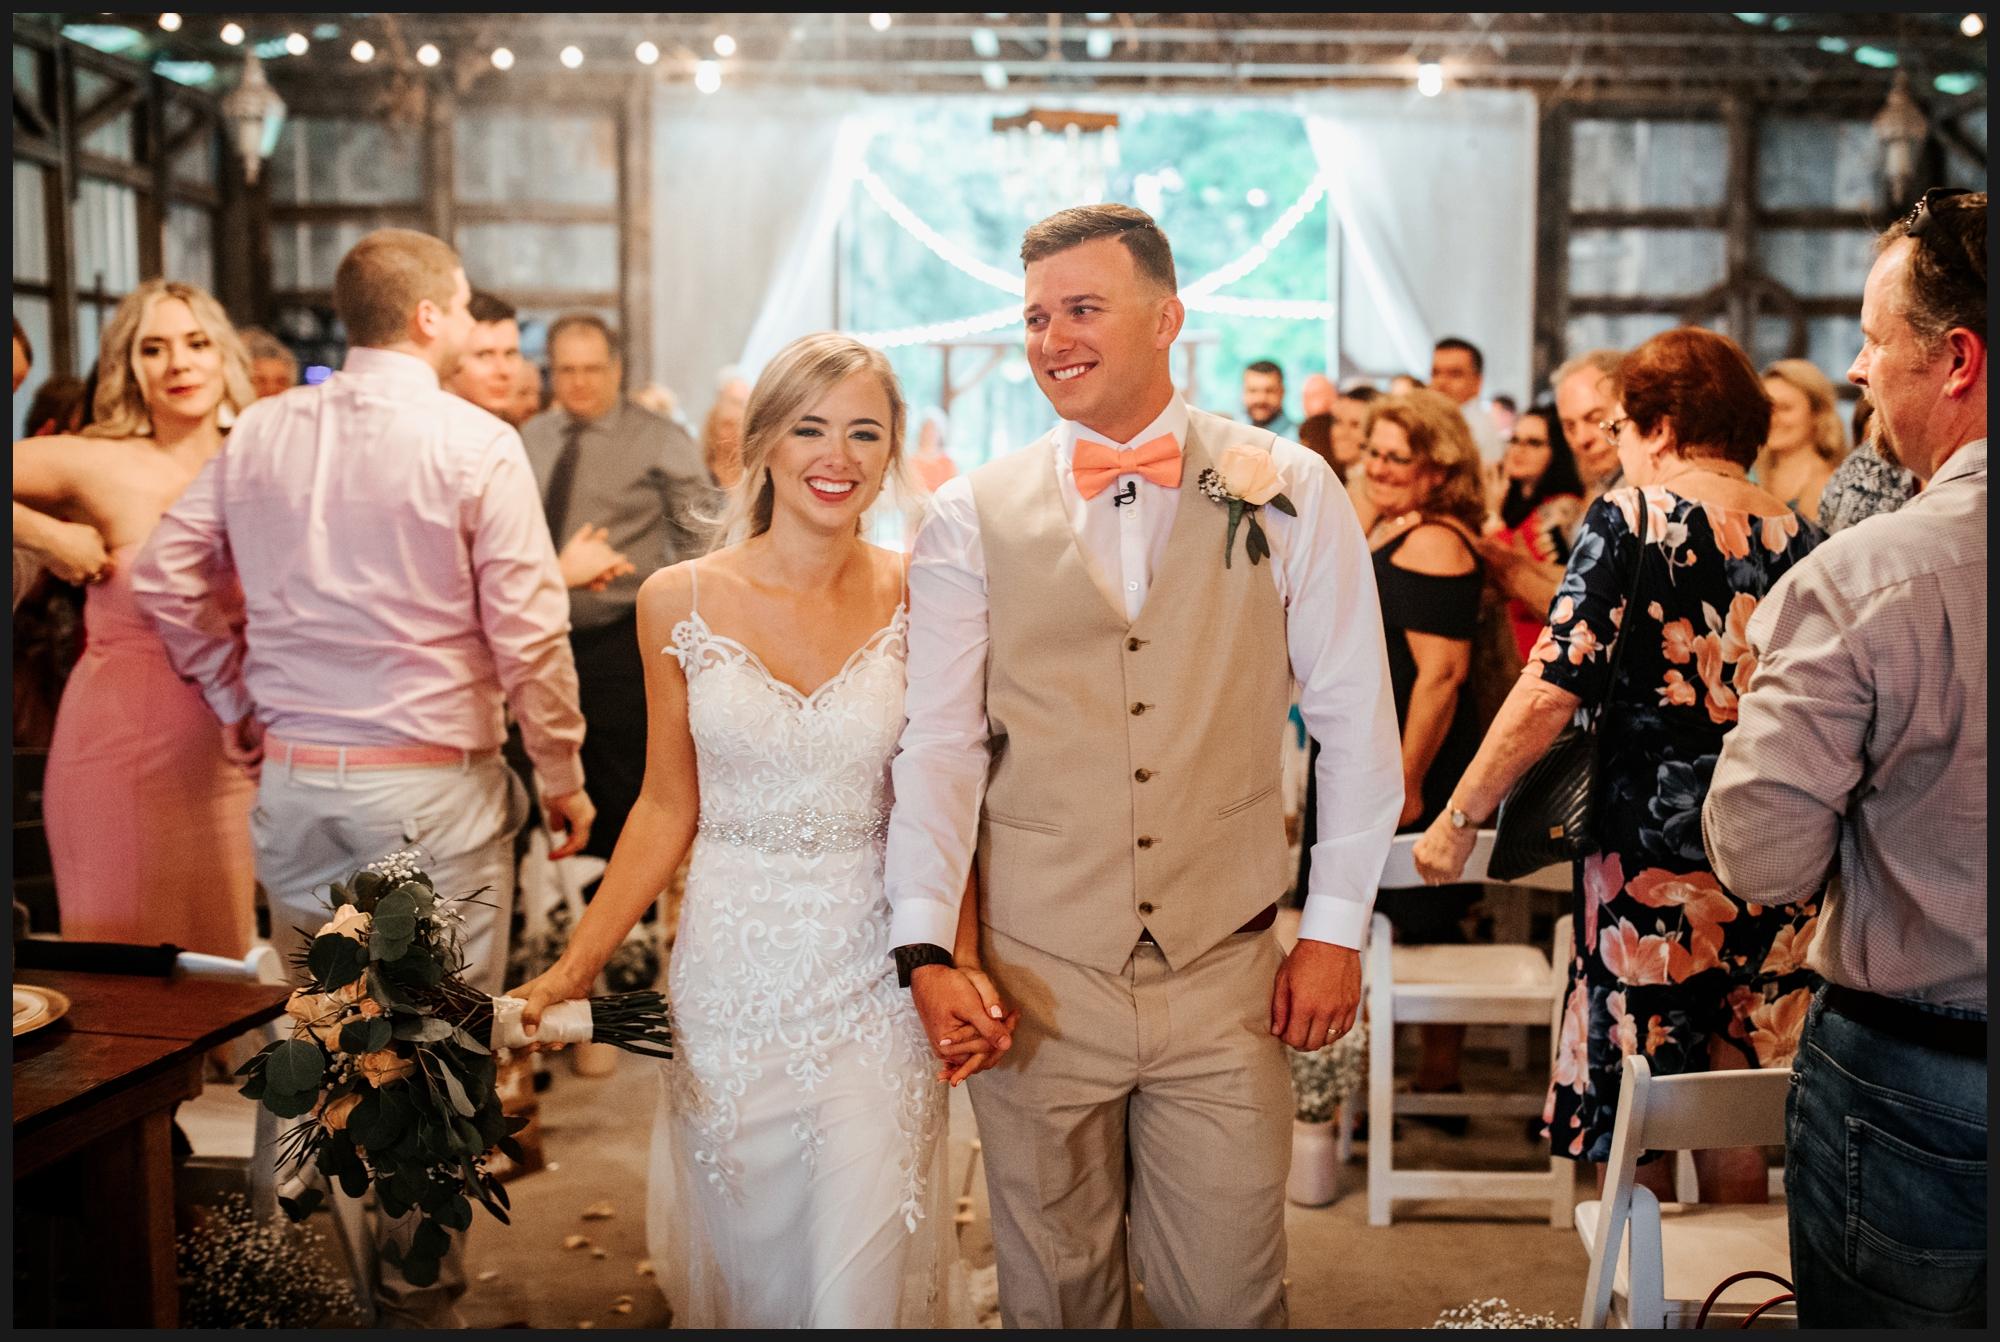 Orlando-Wedding-Photographer-destination-wedding-photographer-florida-wedding-photographer-hawaii-wedding-photographer_0312.jpg